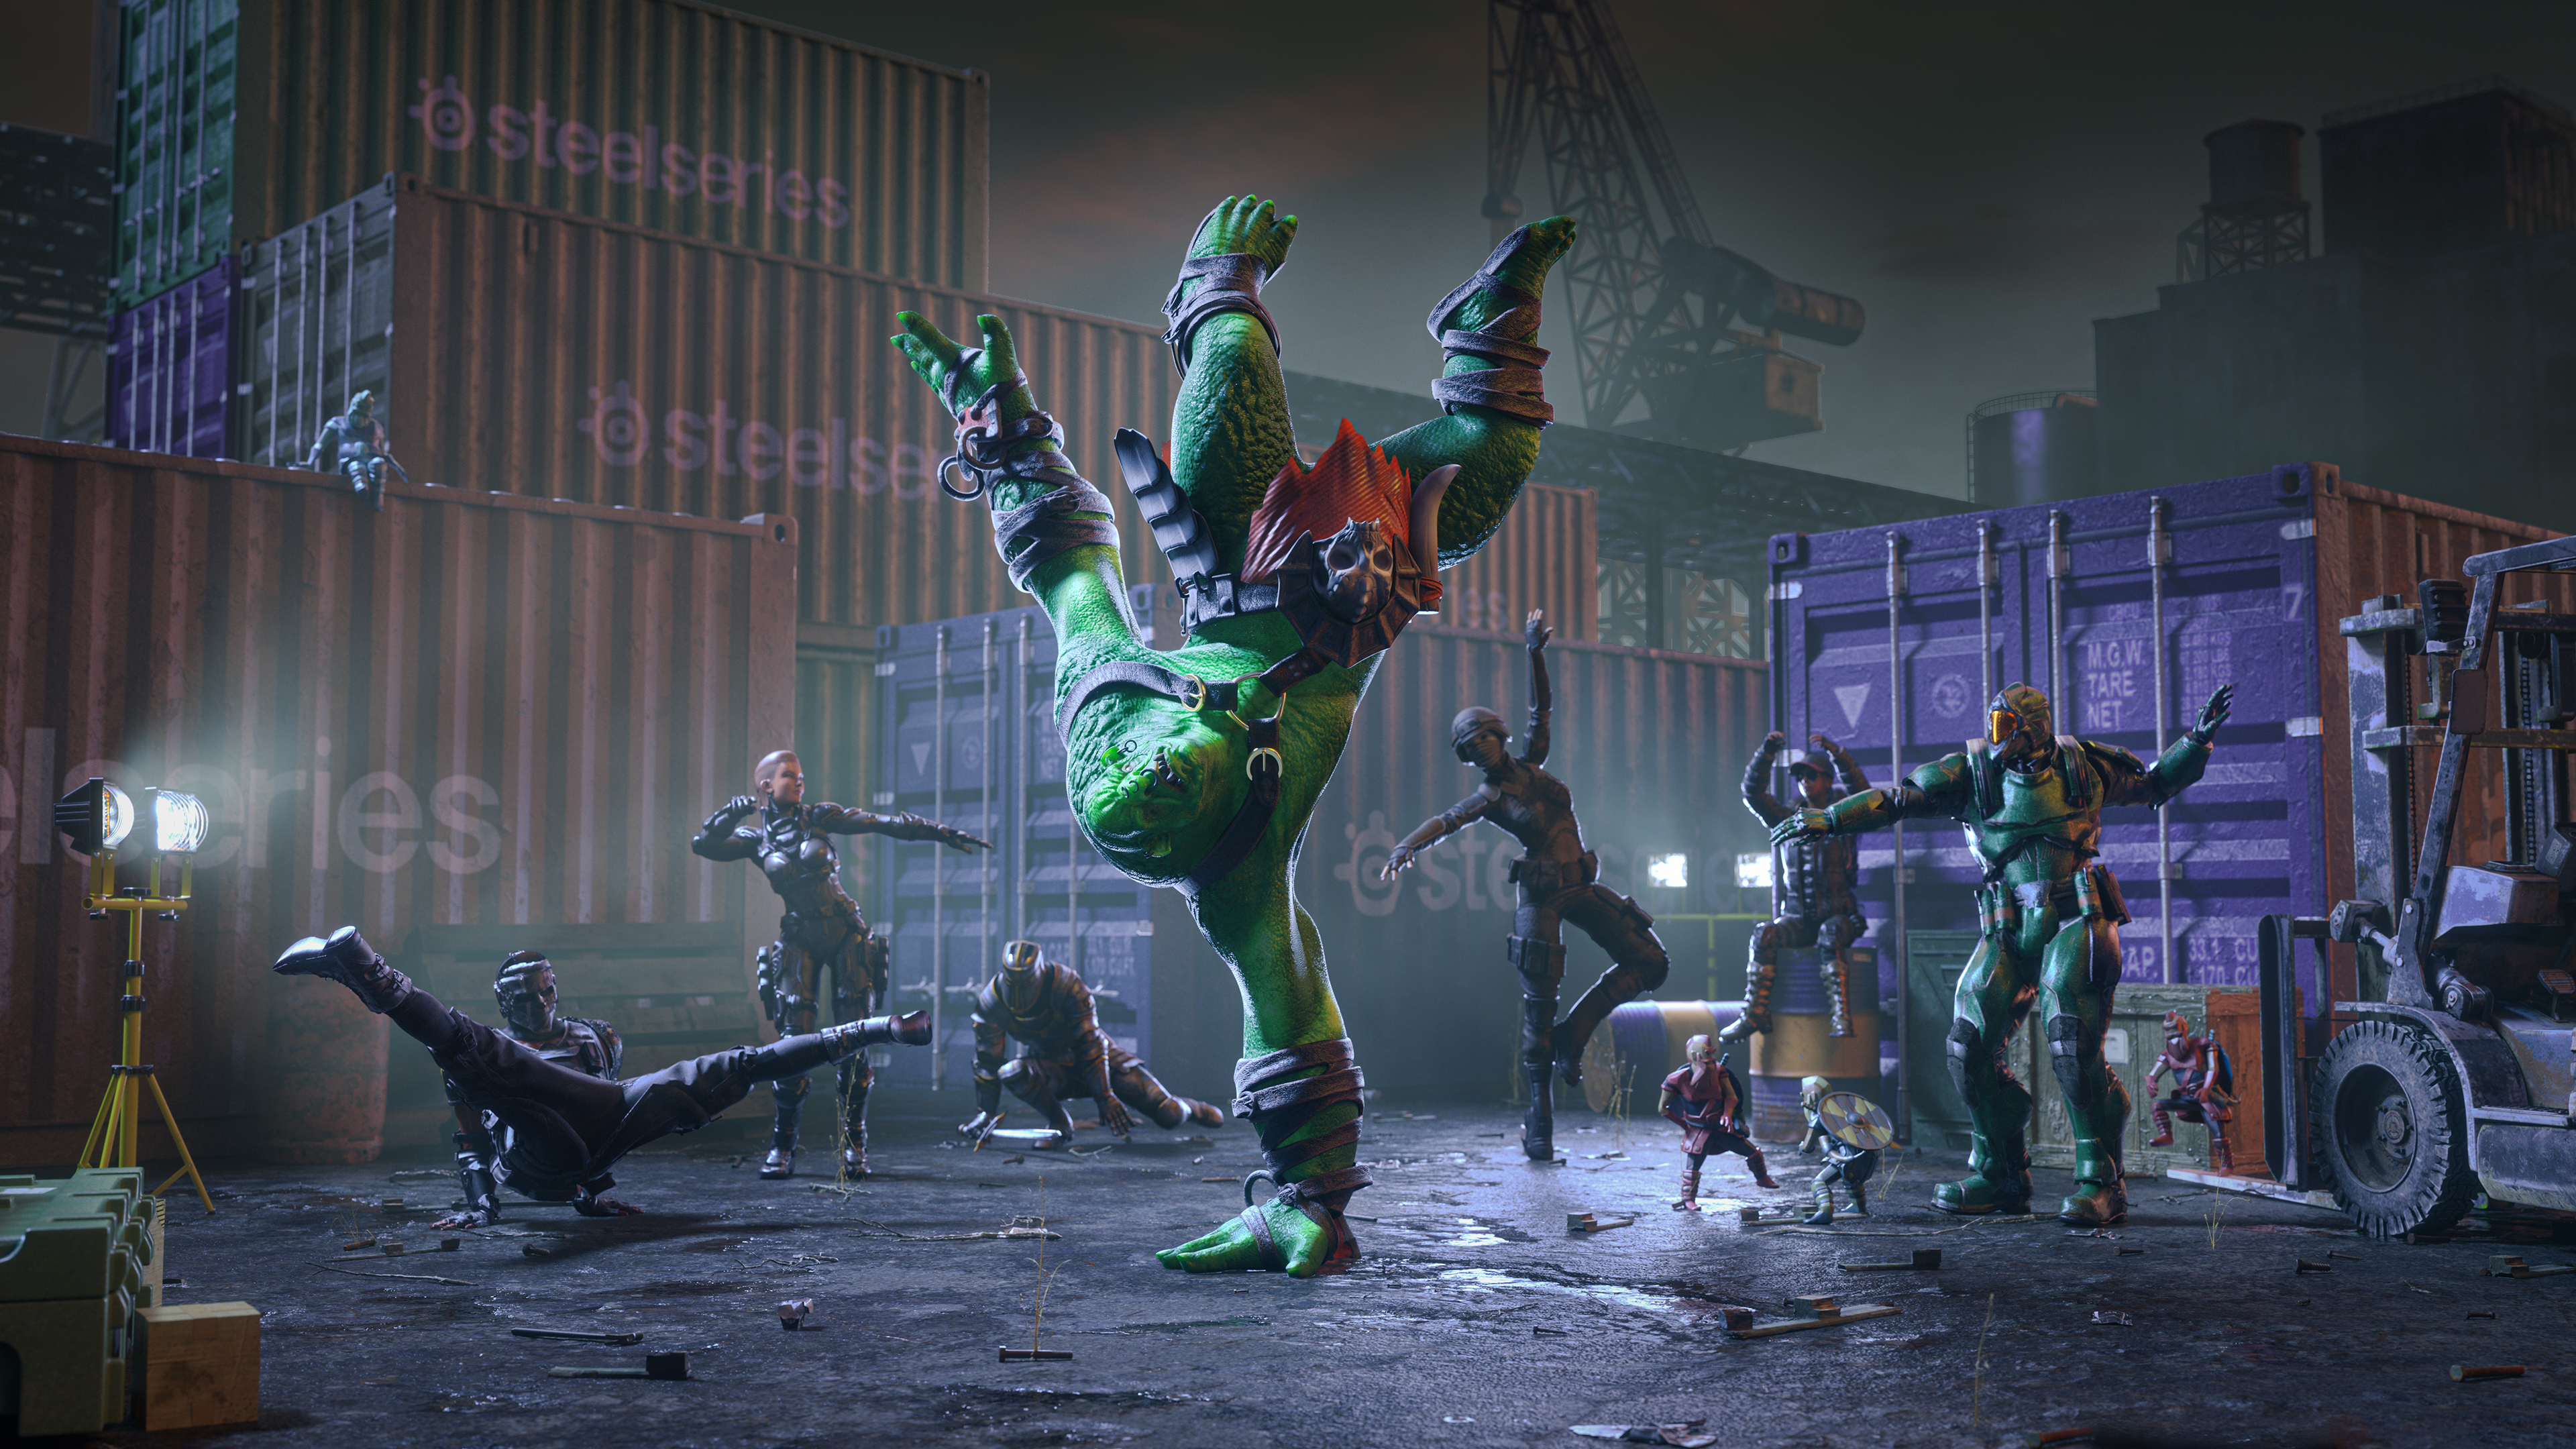 Lars and characters dancing